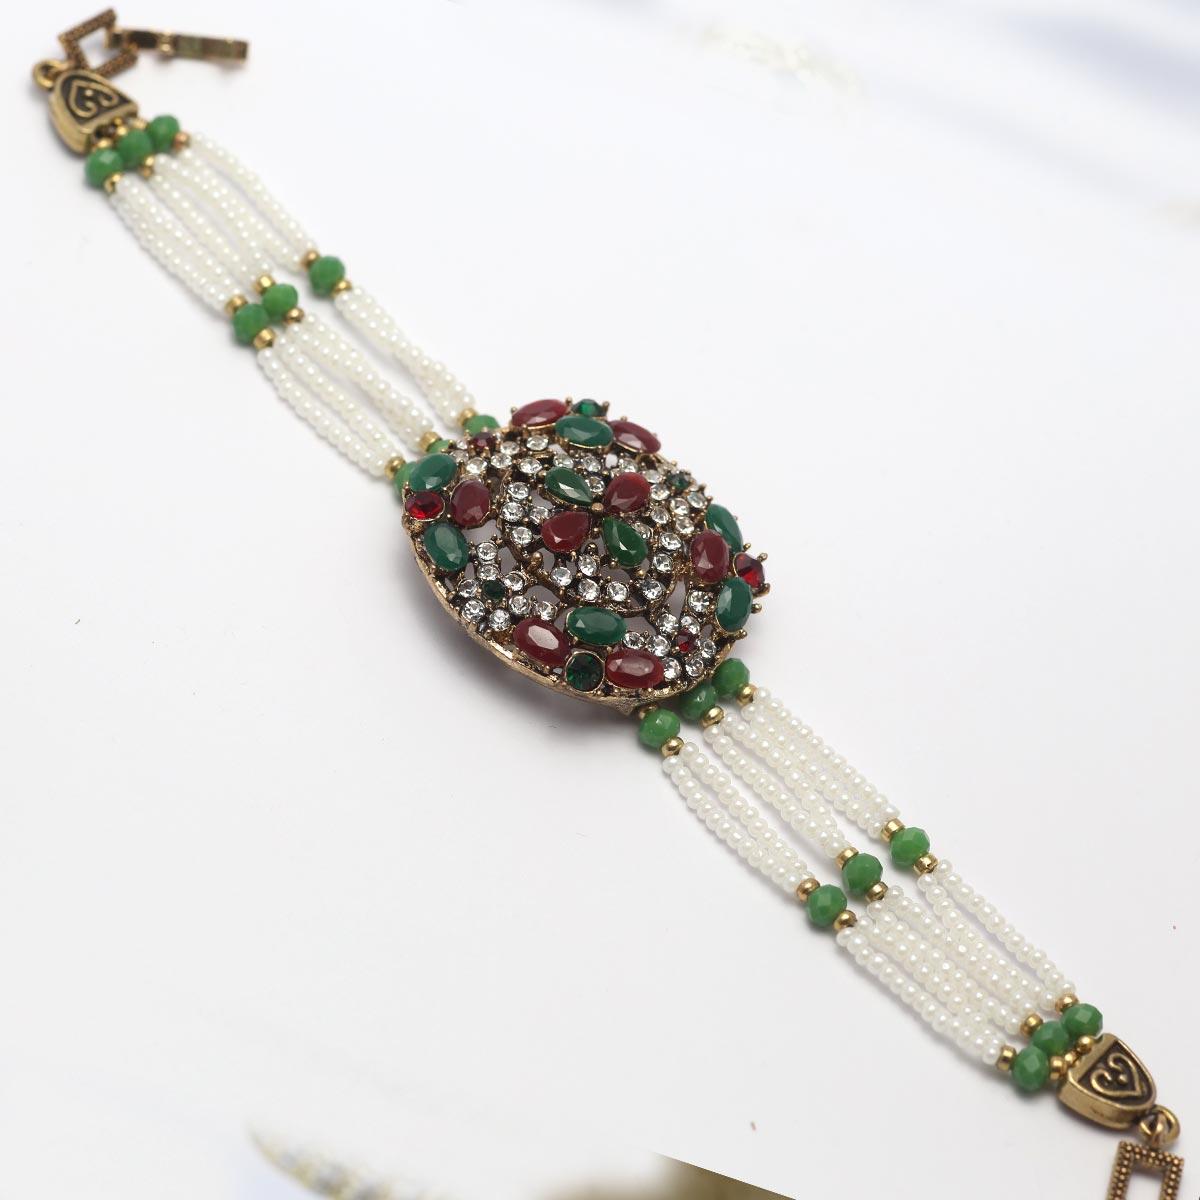 Unique Bracelets Design For Girls - (BH-32) Gallery Image 1